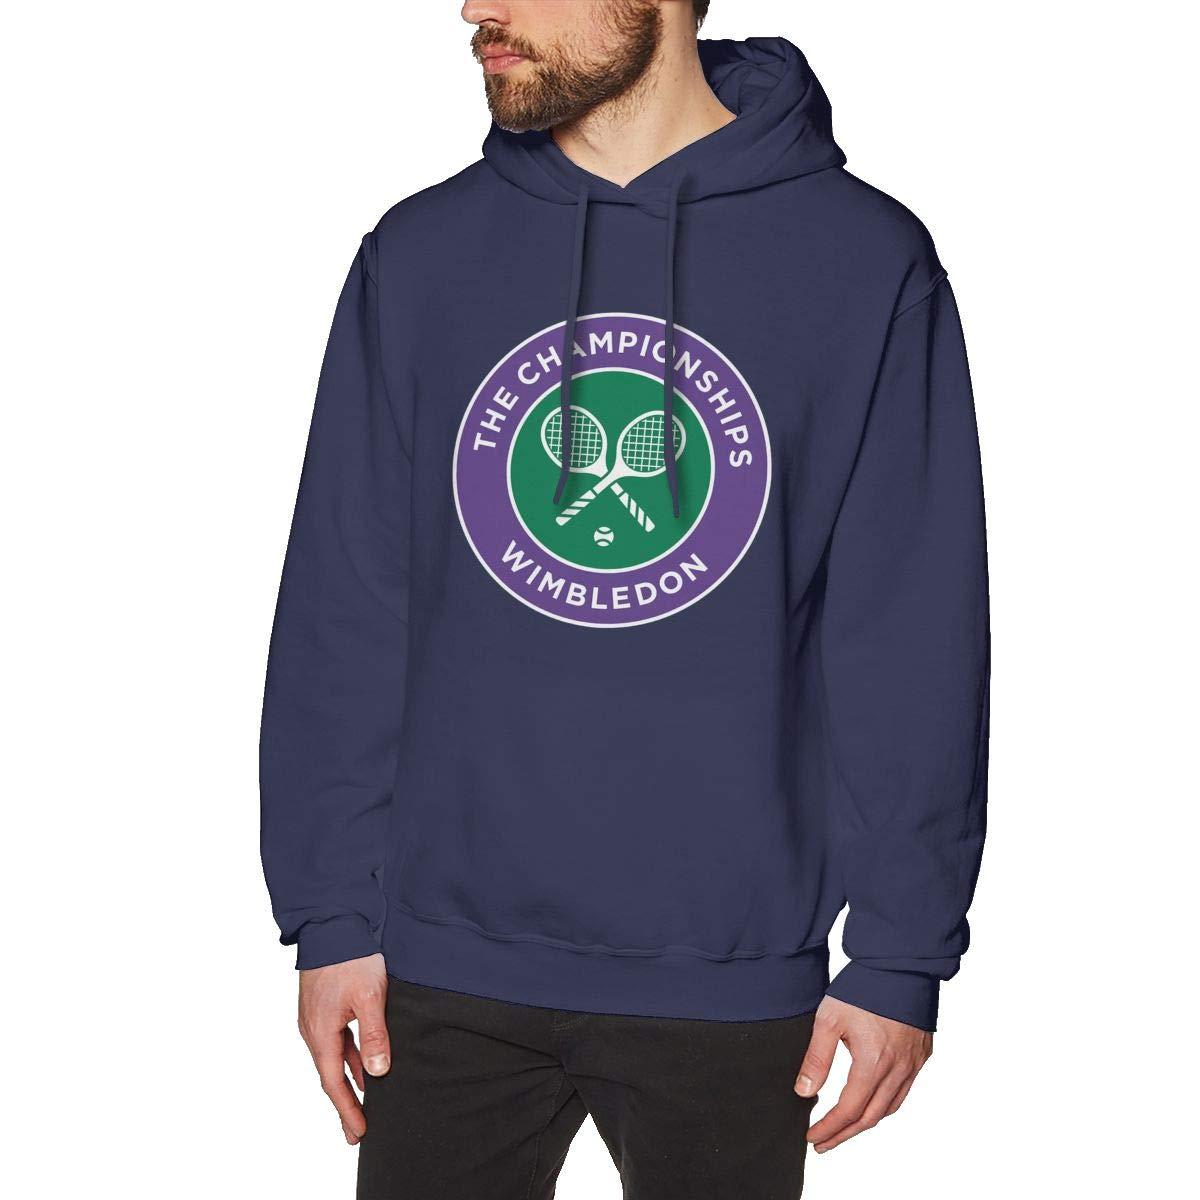 GUPINGER Men 2016 Wimbledon Championships Four Grand Slam Tennis Tournament Logo Warmth Navy Hoodie Sweatshirt Jacket Pullover Tops